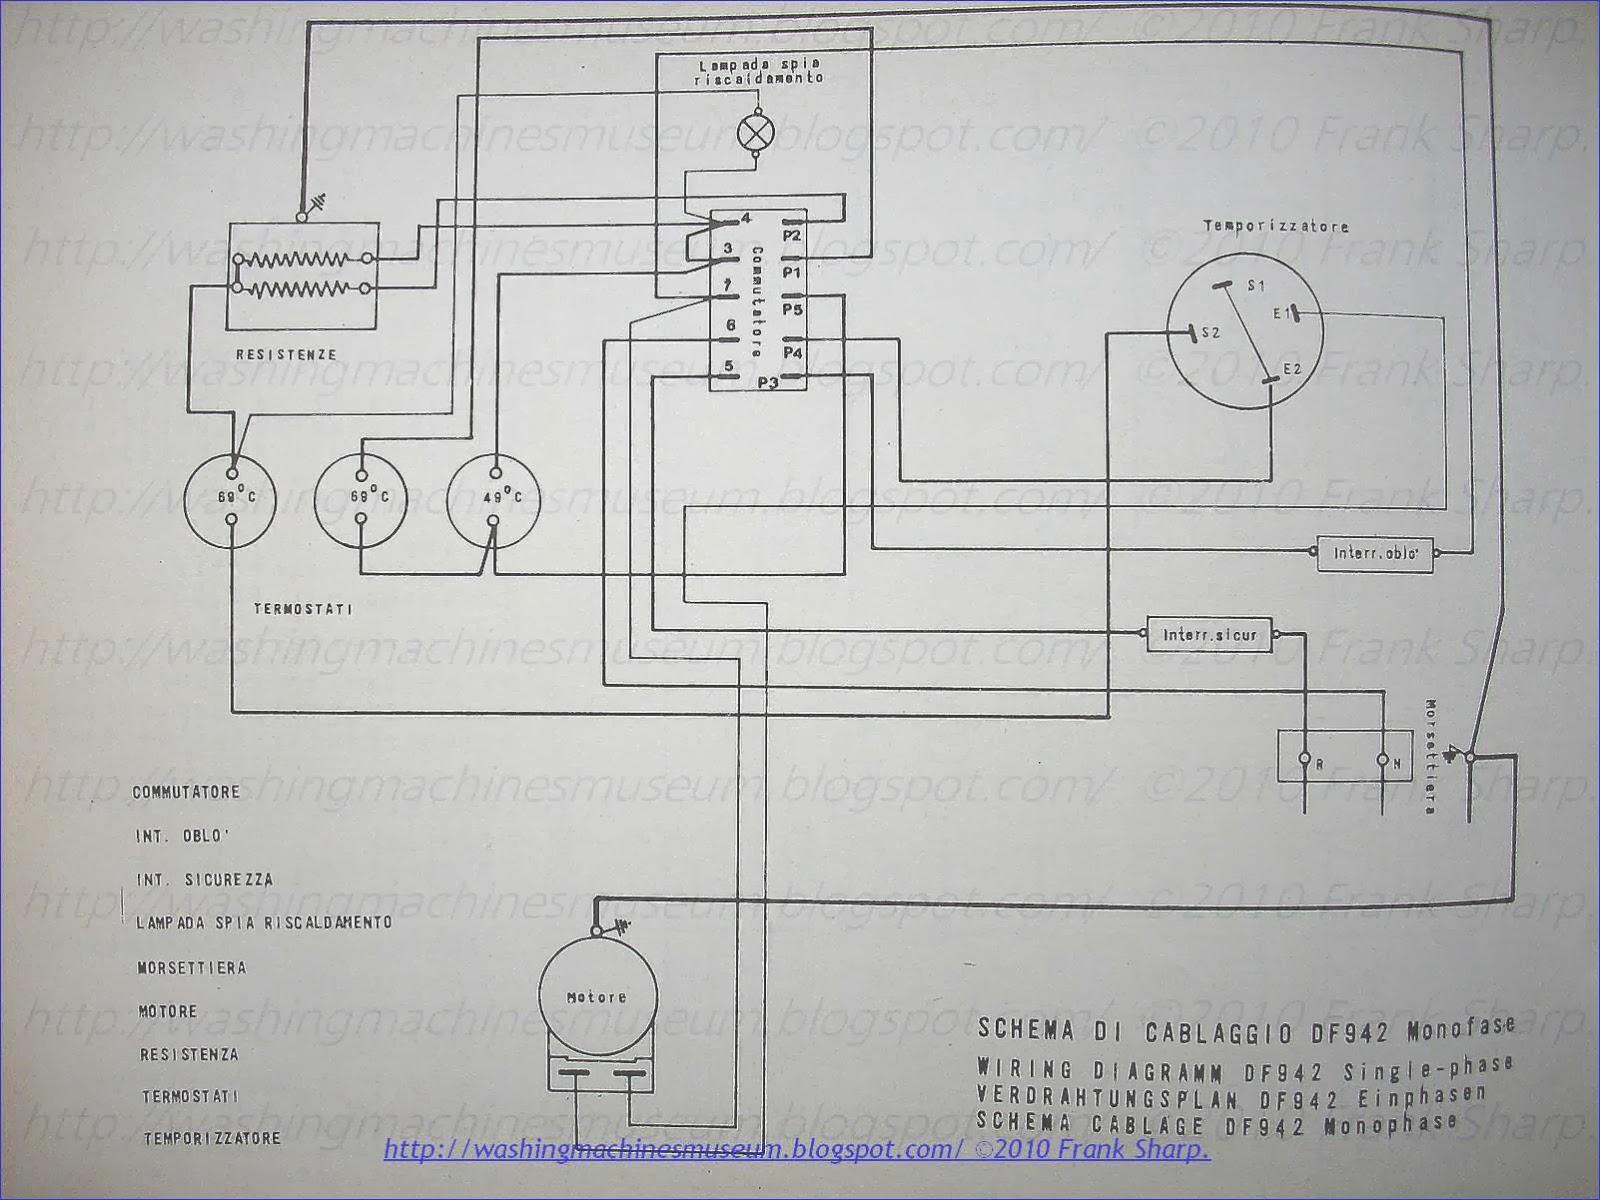 Philco Refrigerator Wiring Diagram Everything About Whirlpool Schematic Washer Rama Museum Df942 Rh Washingmachinesmuseum Blogspot Com